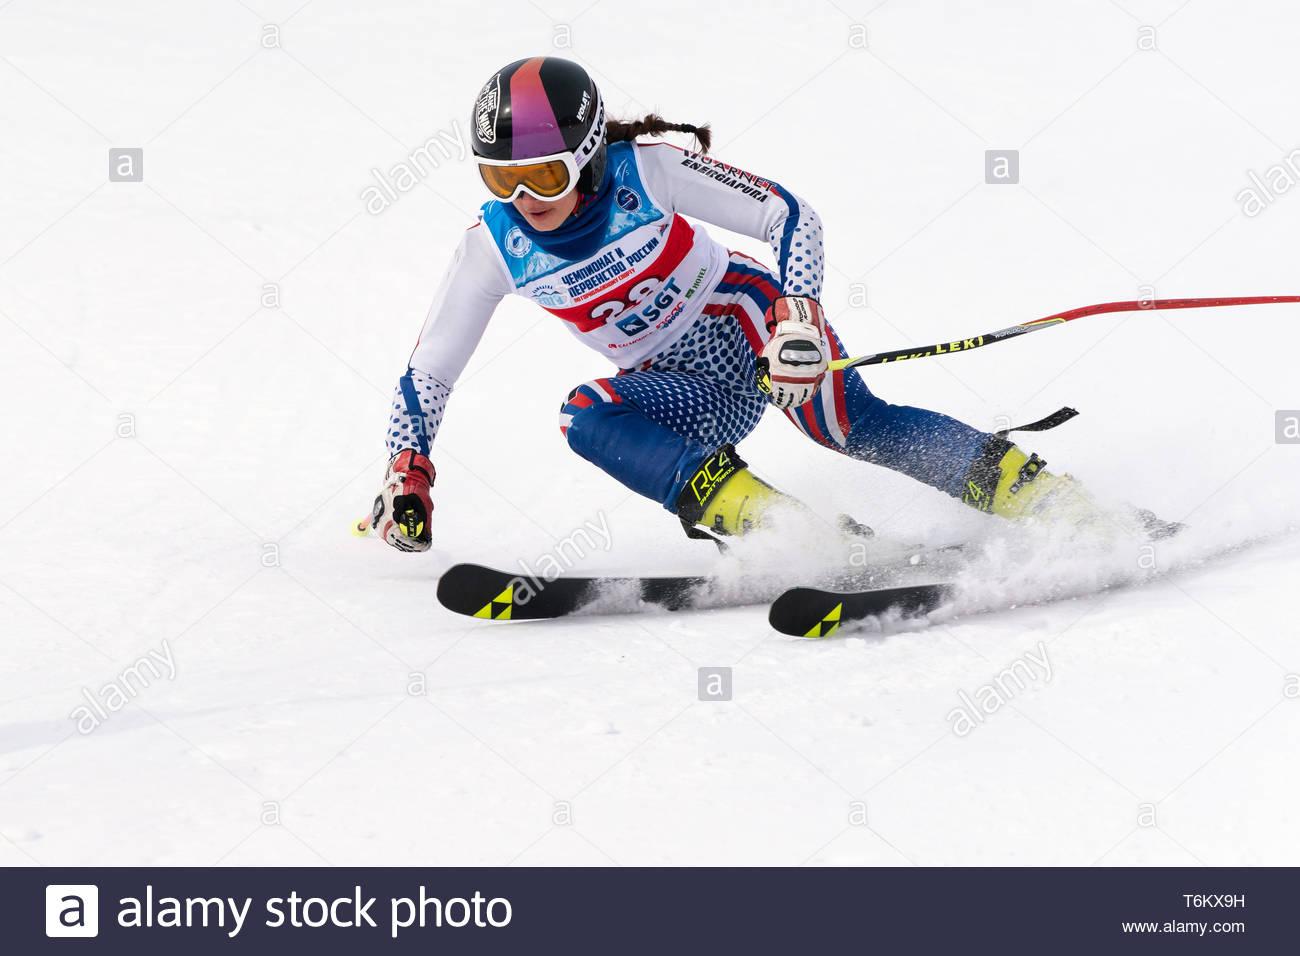 KAMCHATKA PENINSULA, RUSSIA - APRIL 2, 2019: Mountain skier Anna Vakhnina (Krasnoyarsk) skiing down mount. Russian Women's Alpine Skiing Cup, Internat - Stock Image